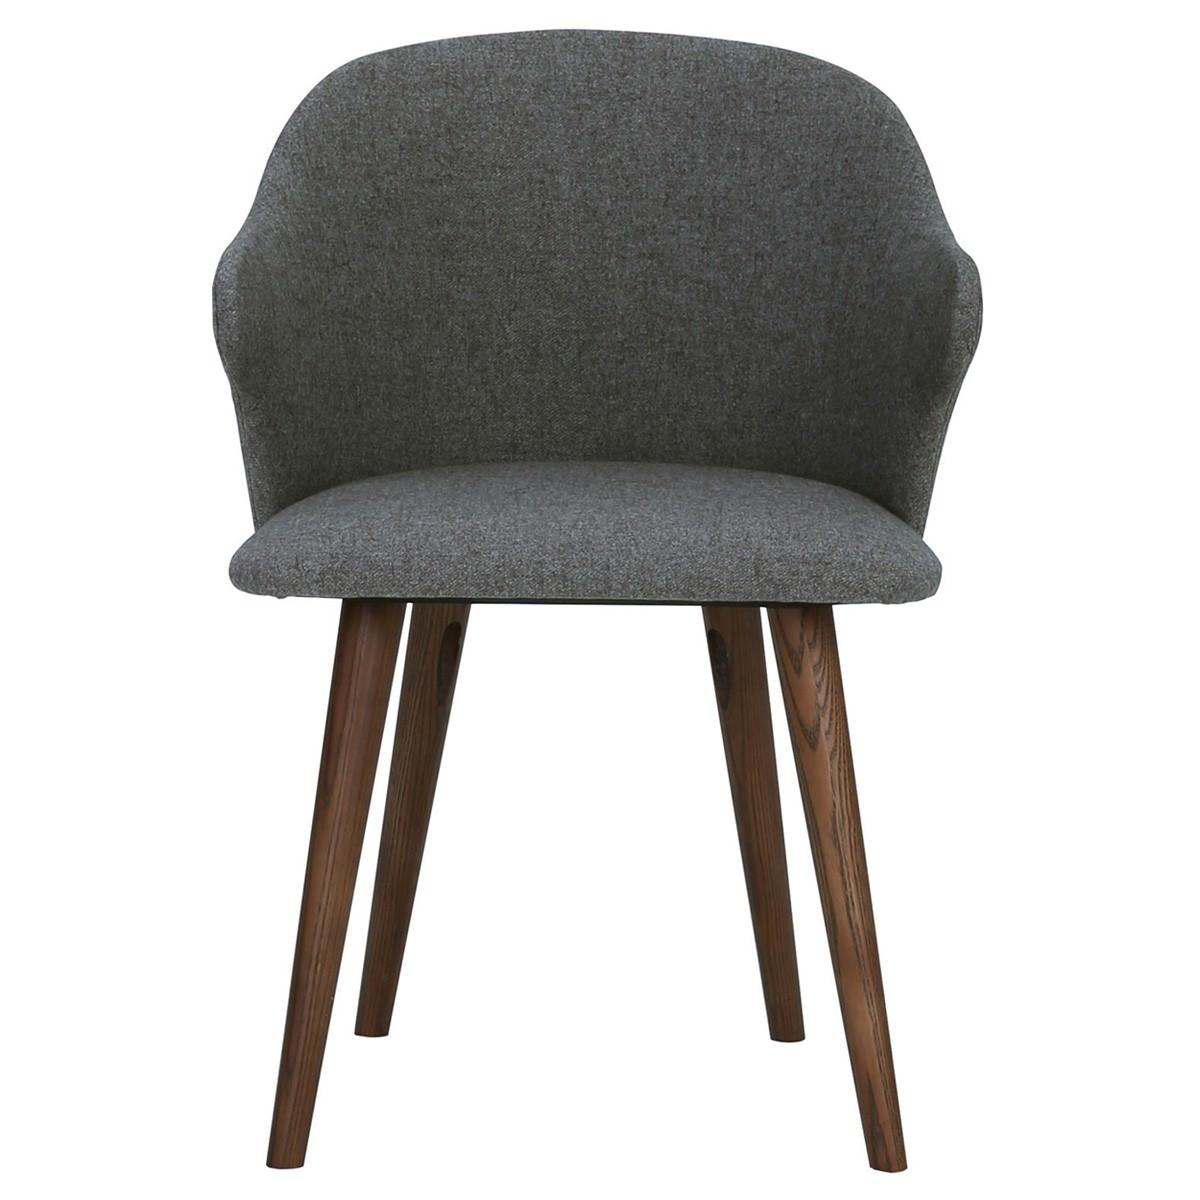 Ceyla Fabric Dining Chair, Dark Grey / Cocoa